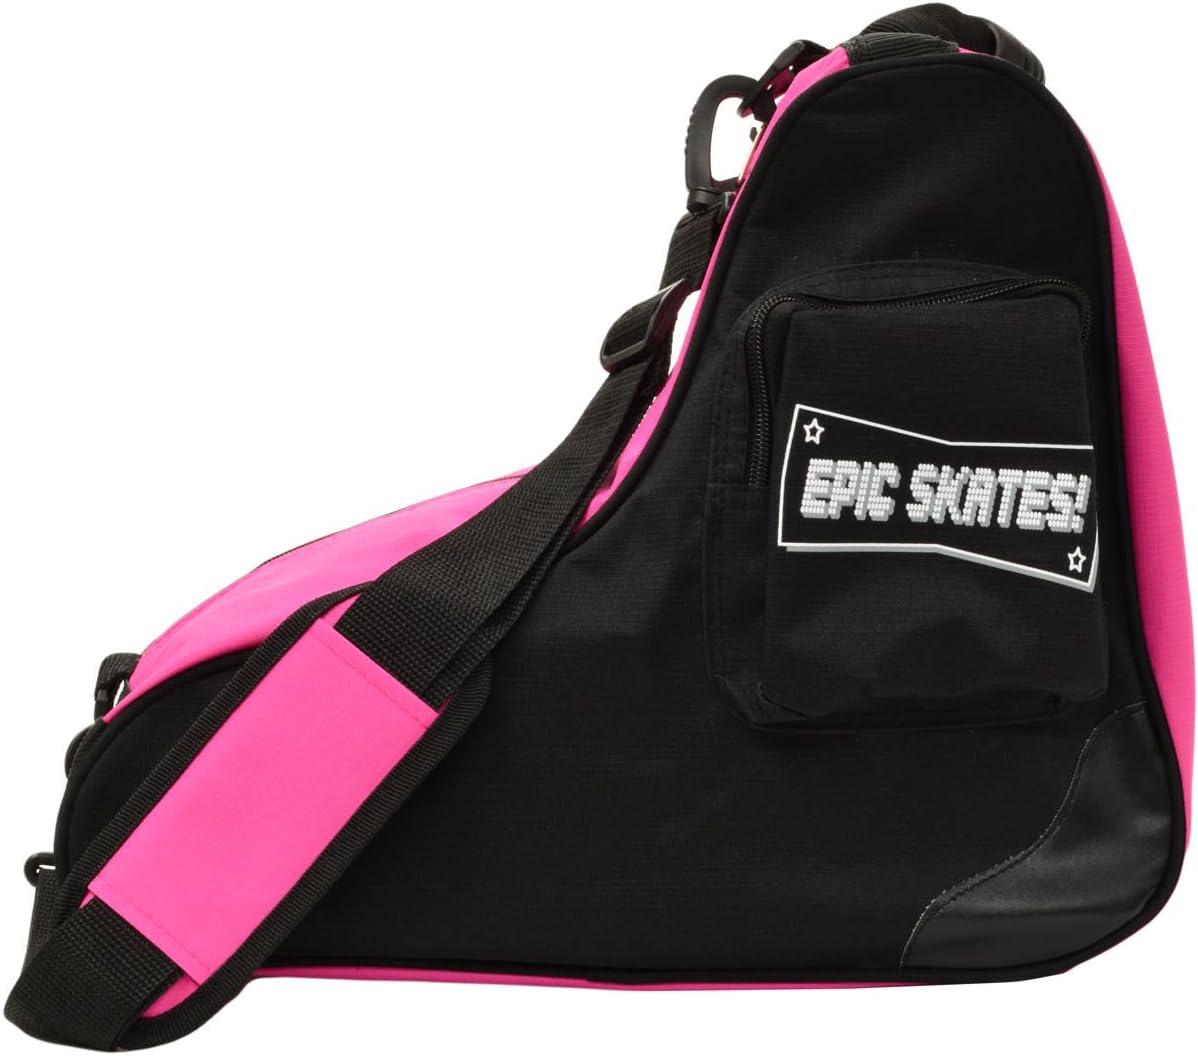 Epic Skates Premium Skate Bag, Black/Pink : Sports & Outdoors